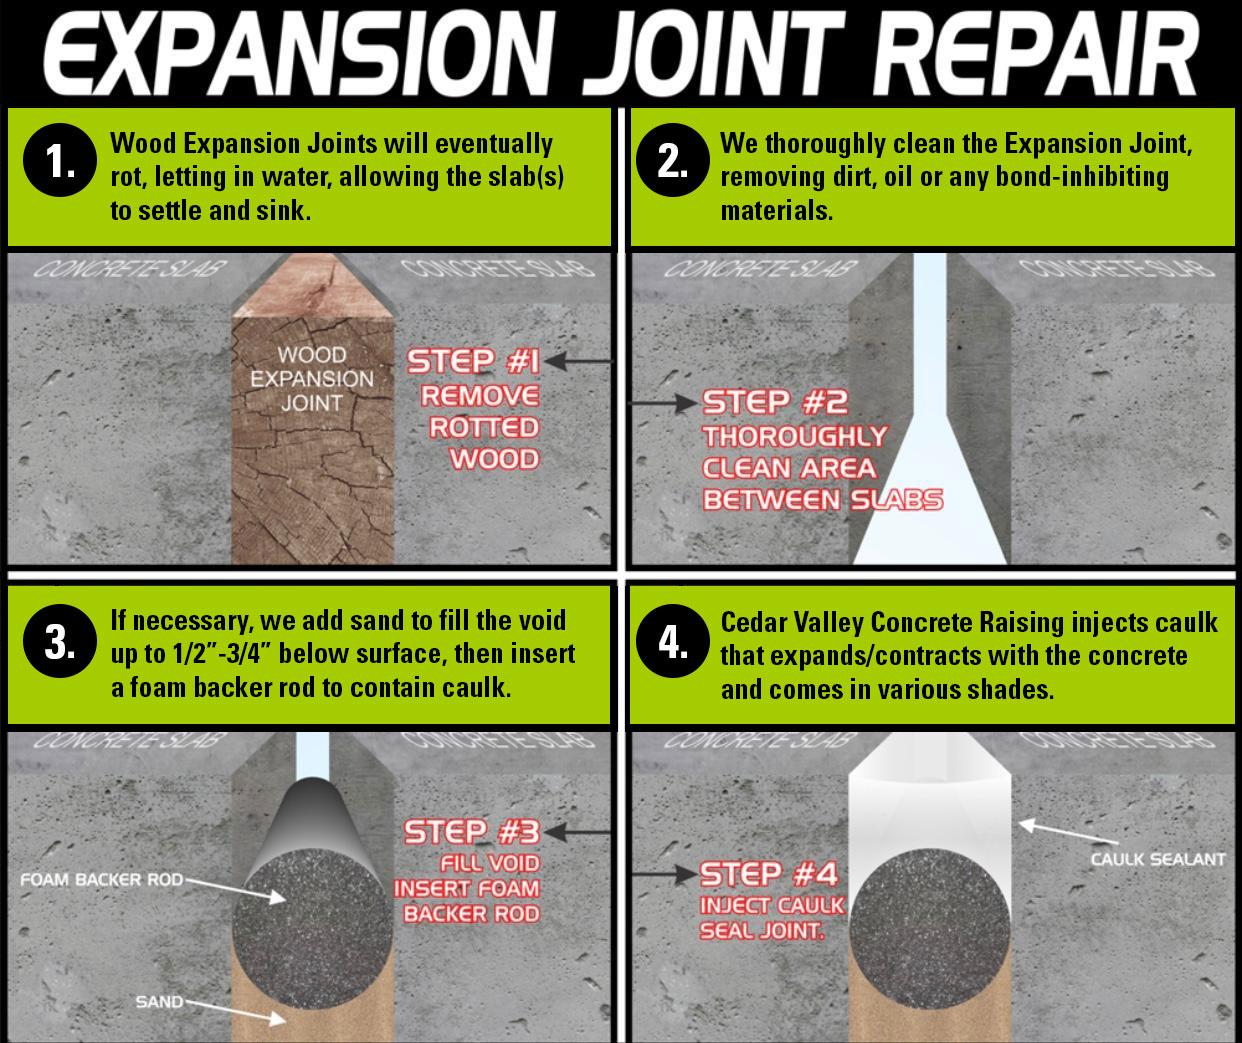 Expansion Joint Replacement - Cedar Valley Concrete Raising